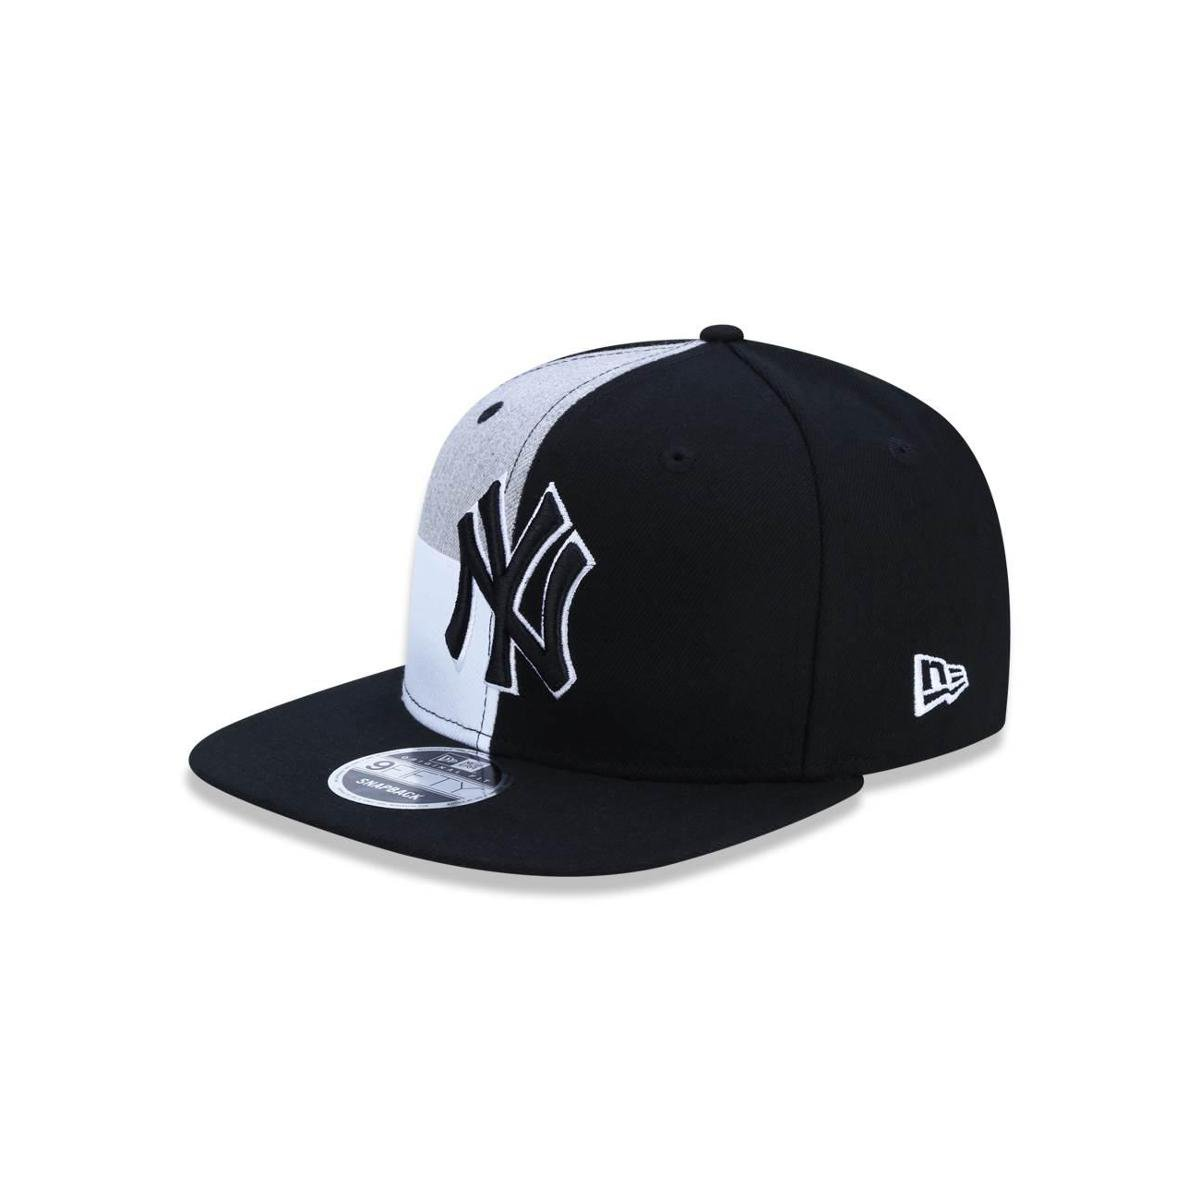 Bone 950 Original Fit New York Yankees MLB Aba Reta Snapback Preto Cinza  New Era ... 48ce56fa90c